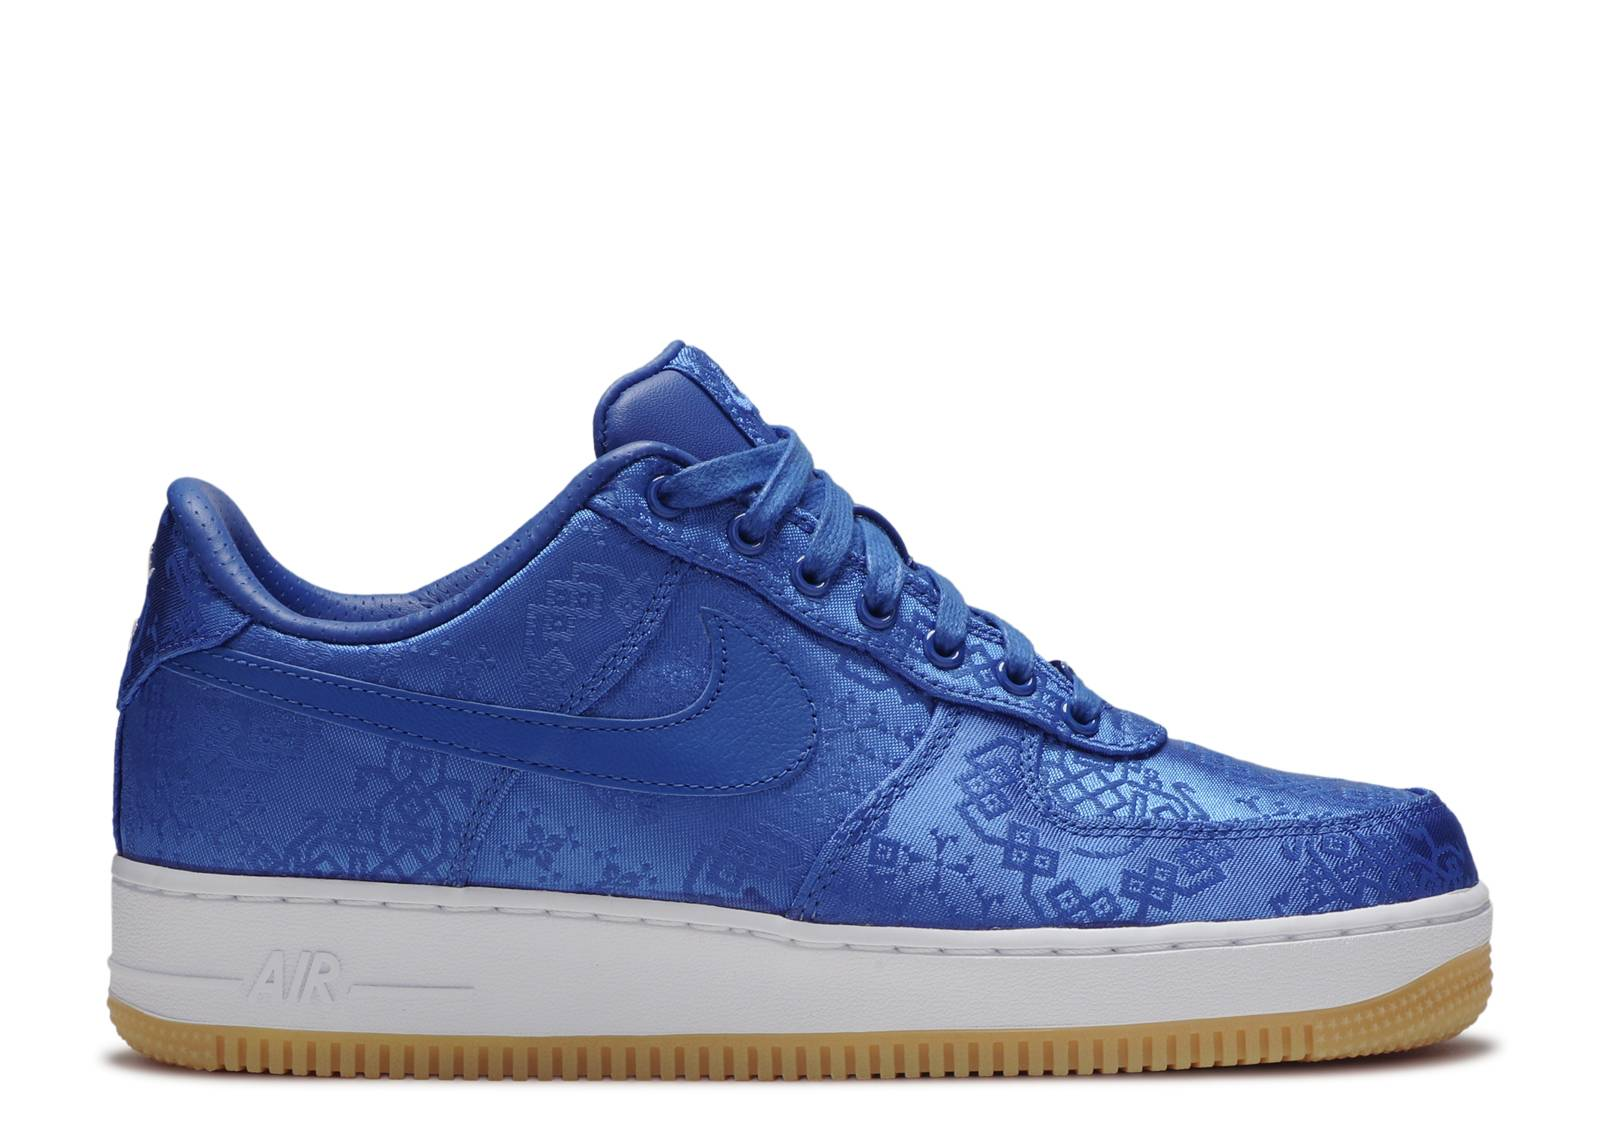 Clot X Air Force 1 Prm Royal Silk Nike Cj5290 400